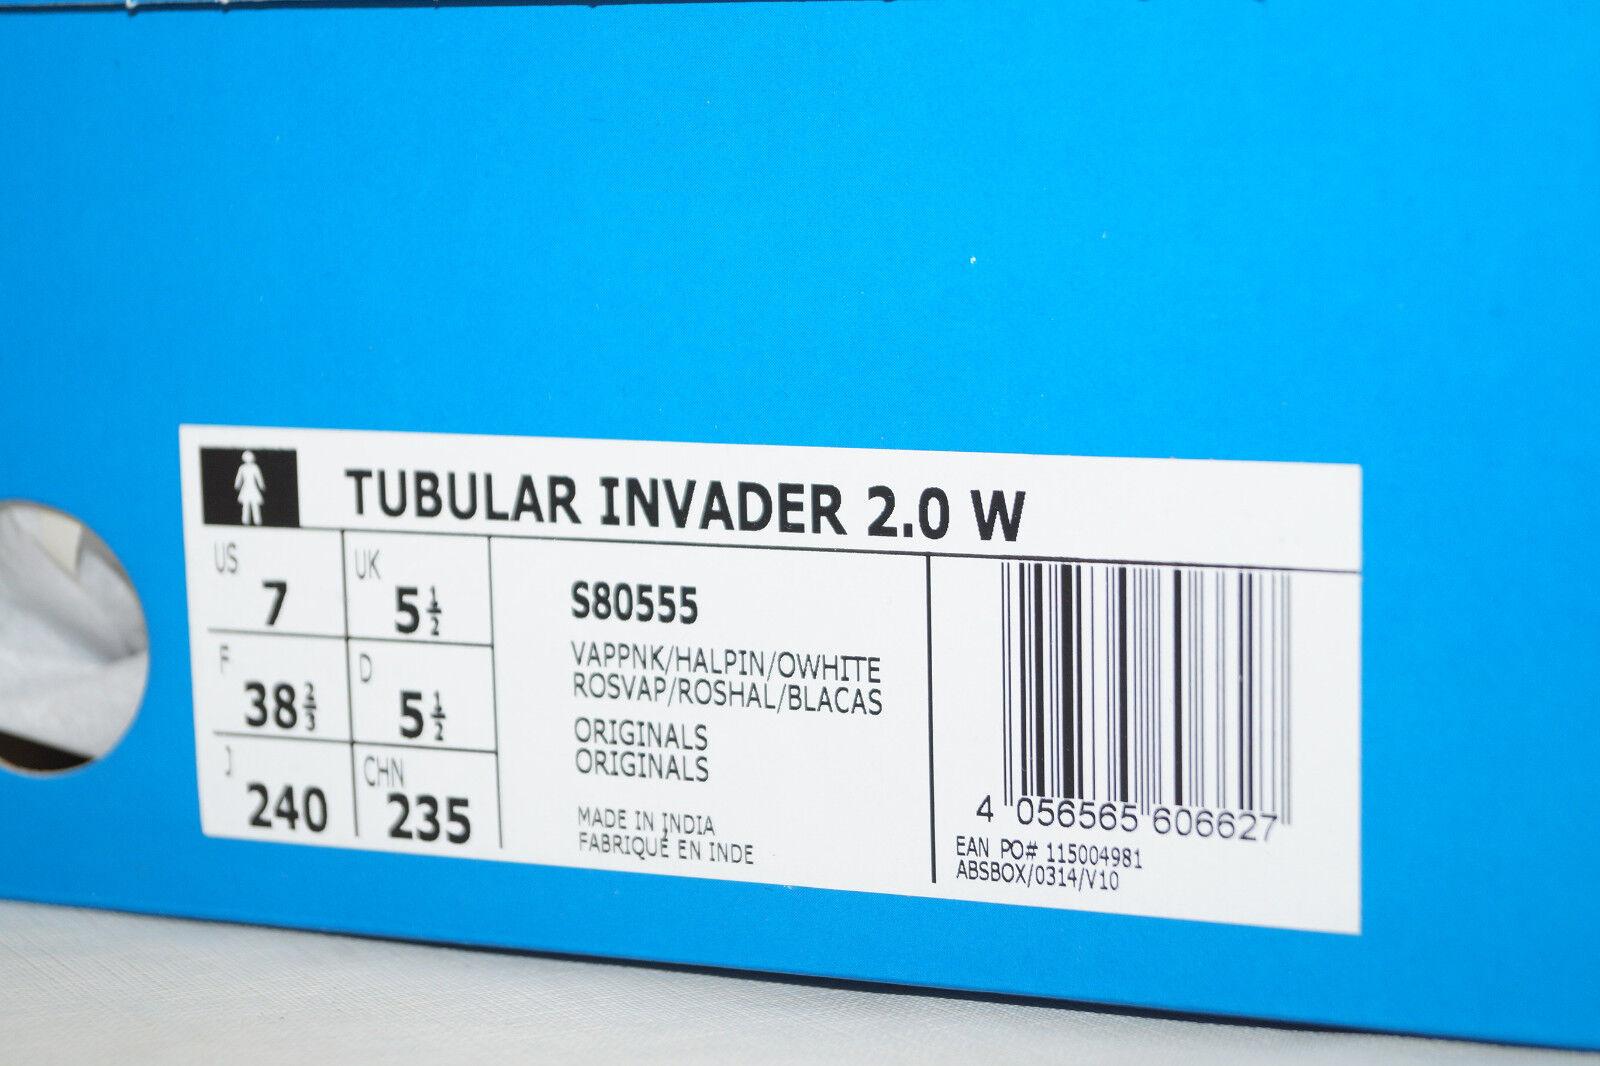 Adidas originals TUBULAR INVADER 2.0 pink W 38.6 UK 5.5 pink 2.0 S80555 Sneakers a193df